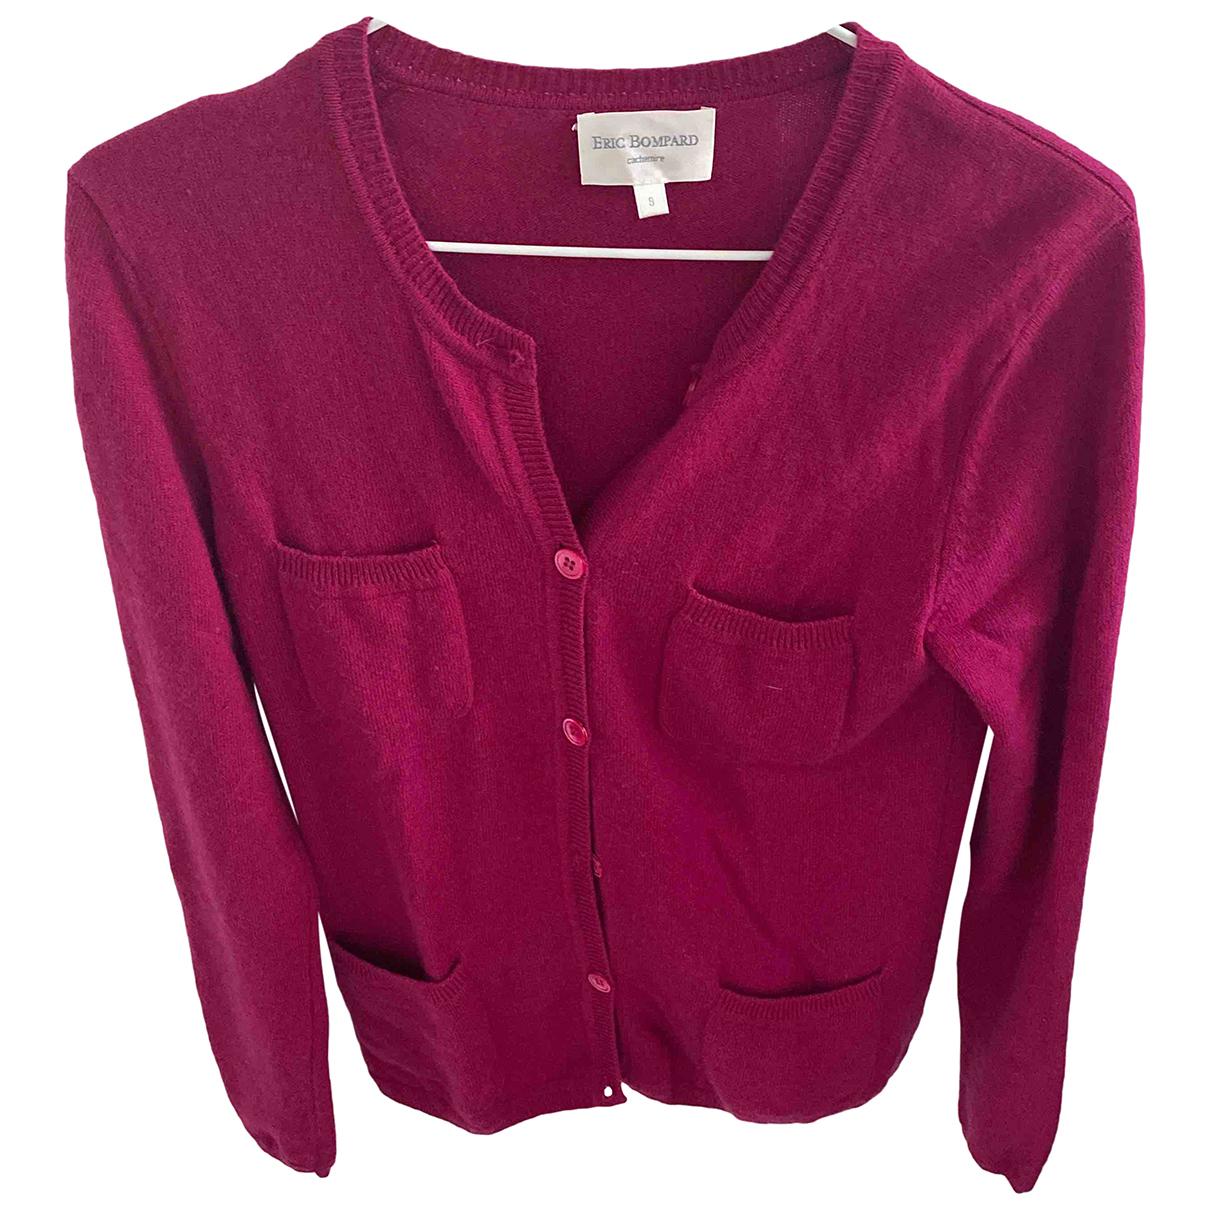 Eric Bompard N Purple Cashmere Knitwear for Women S International